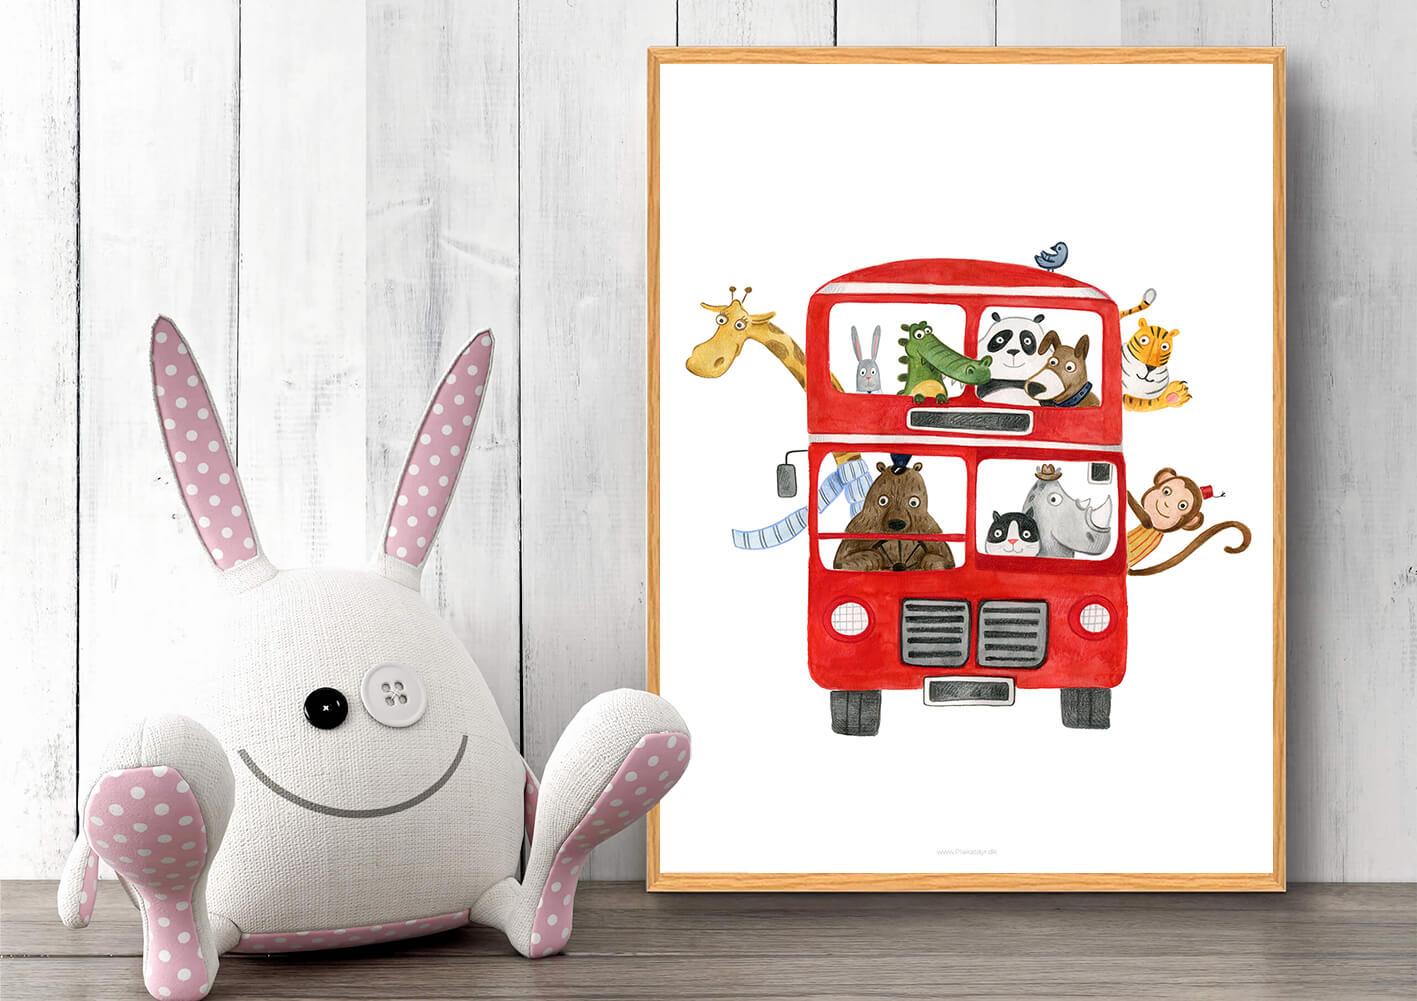 Plakat-med-bus-boernevaerelset-dyr-2